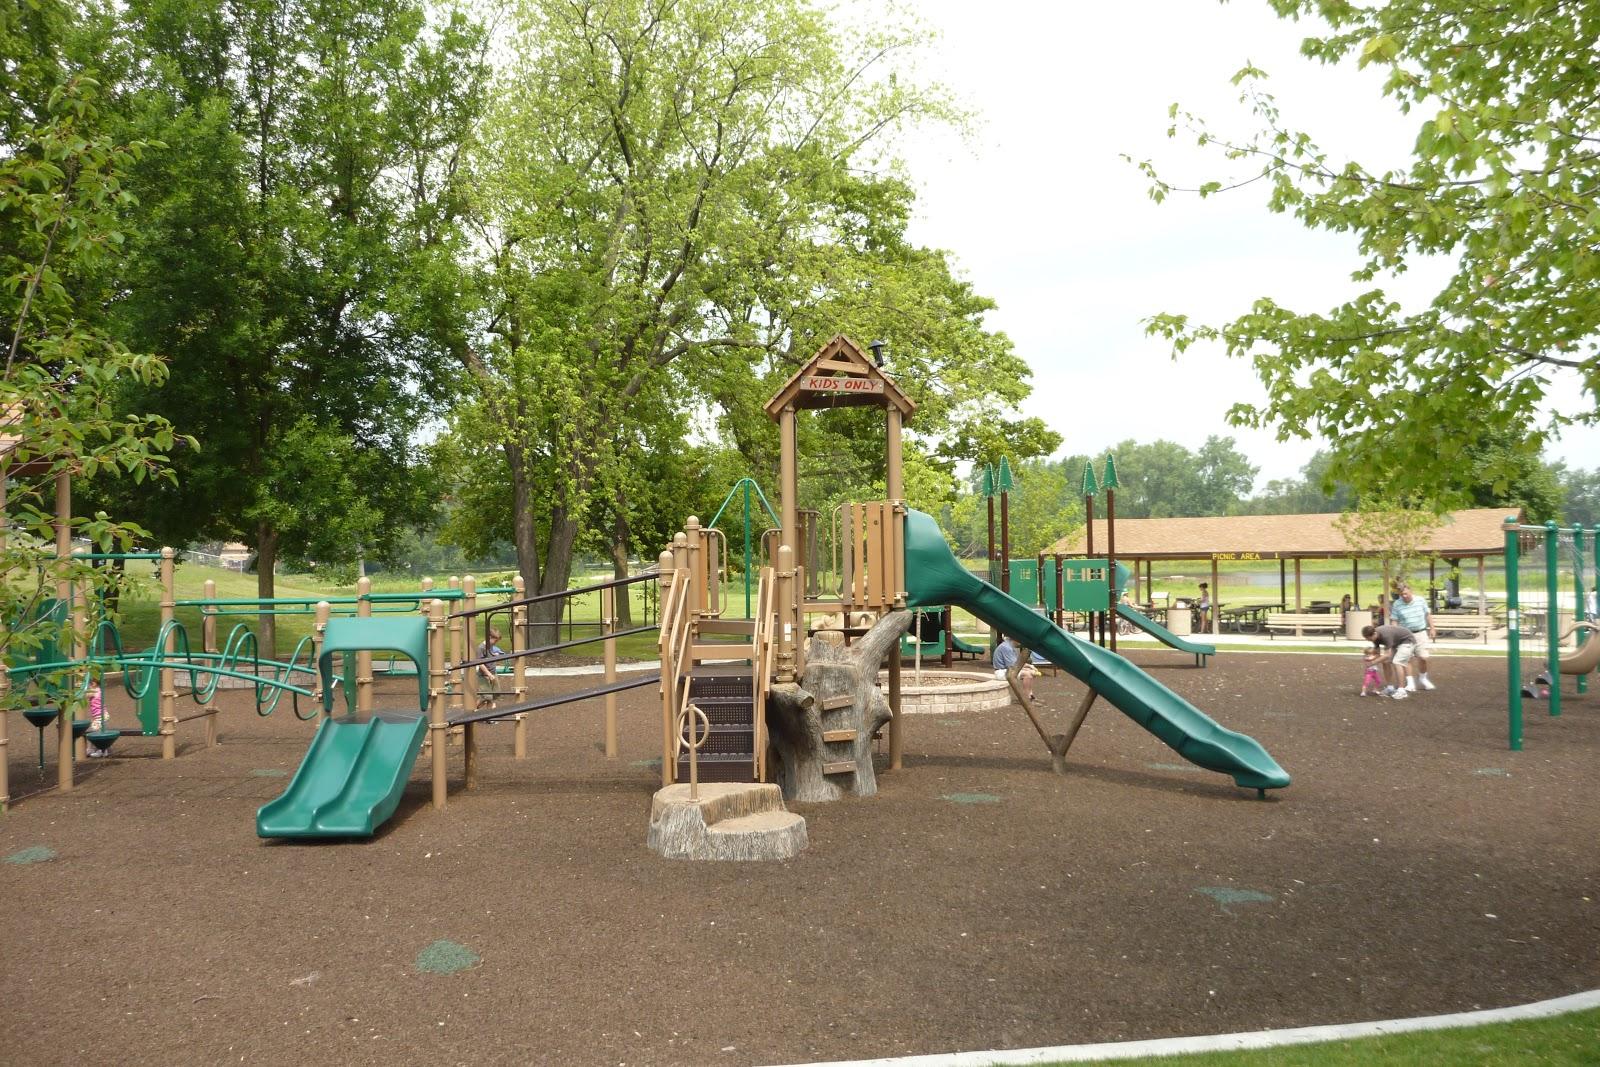 Playground Fun Northside Park Wheaton